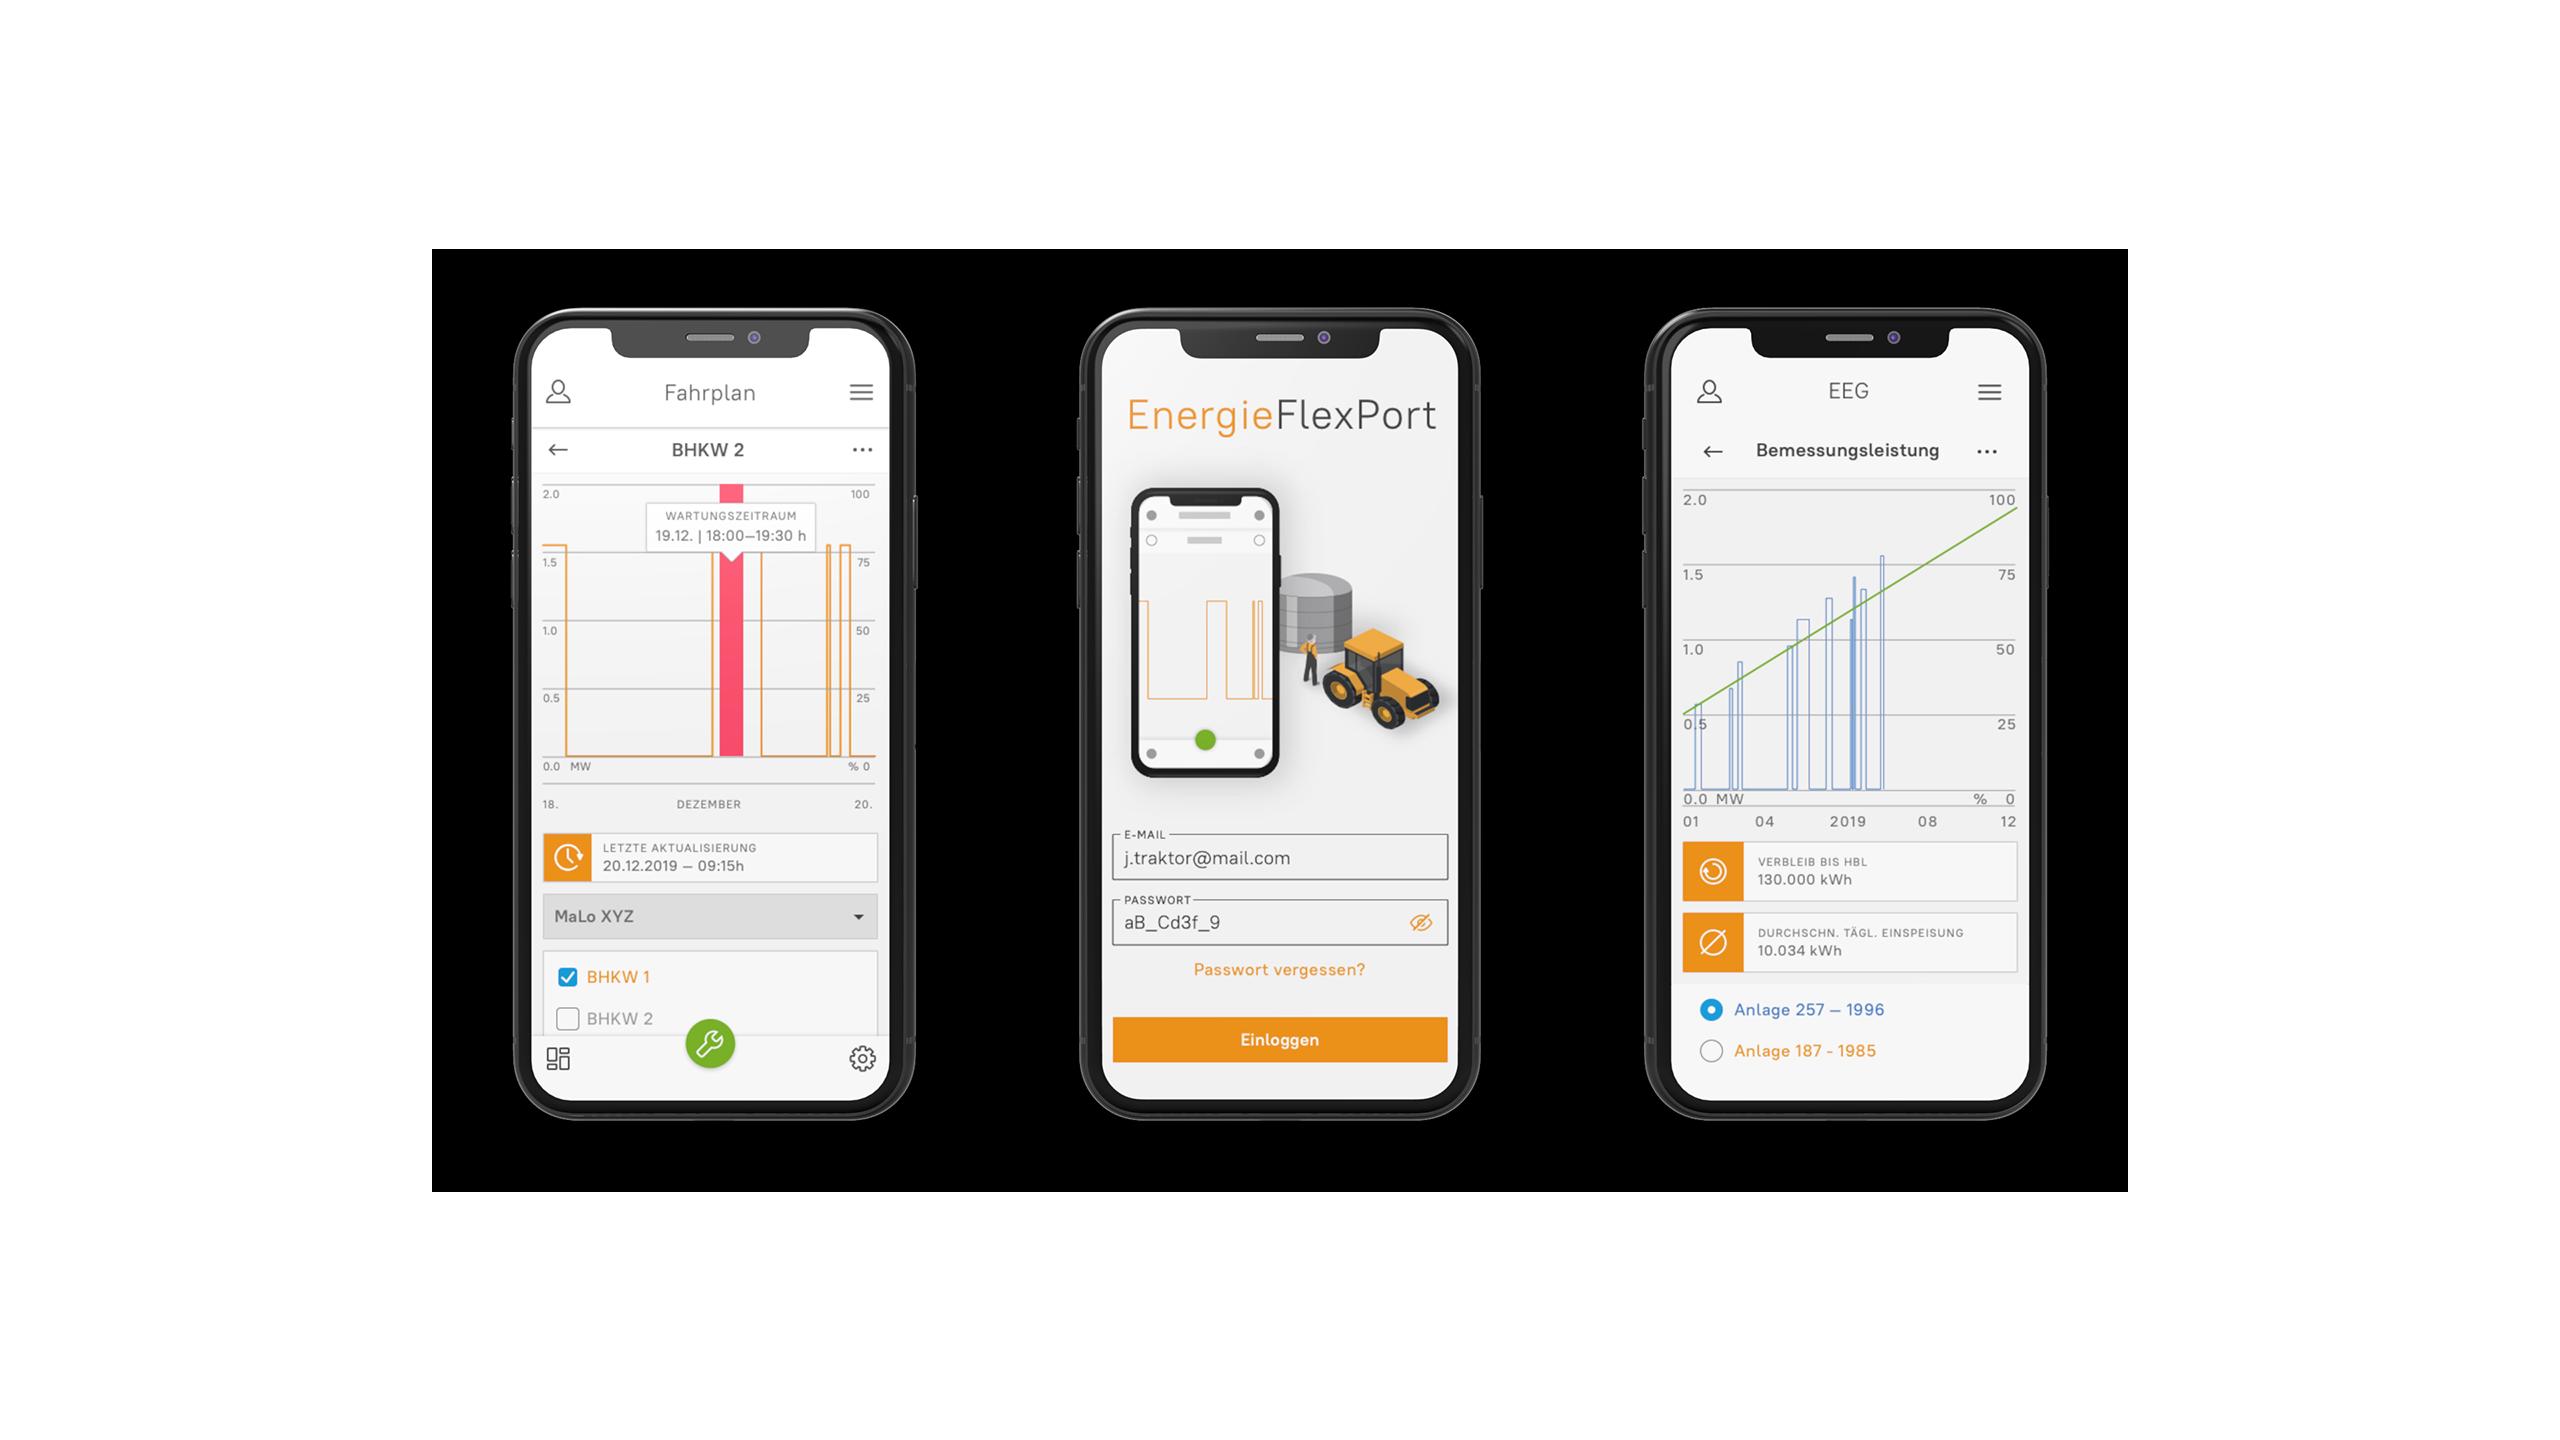 UI design of the Energy FlexPort